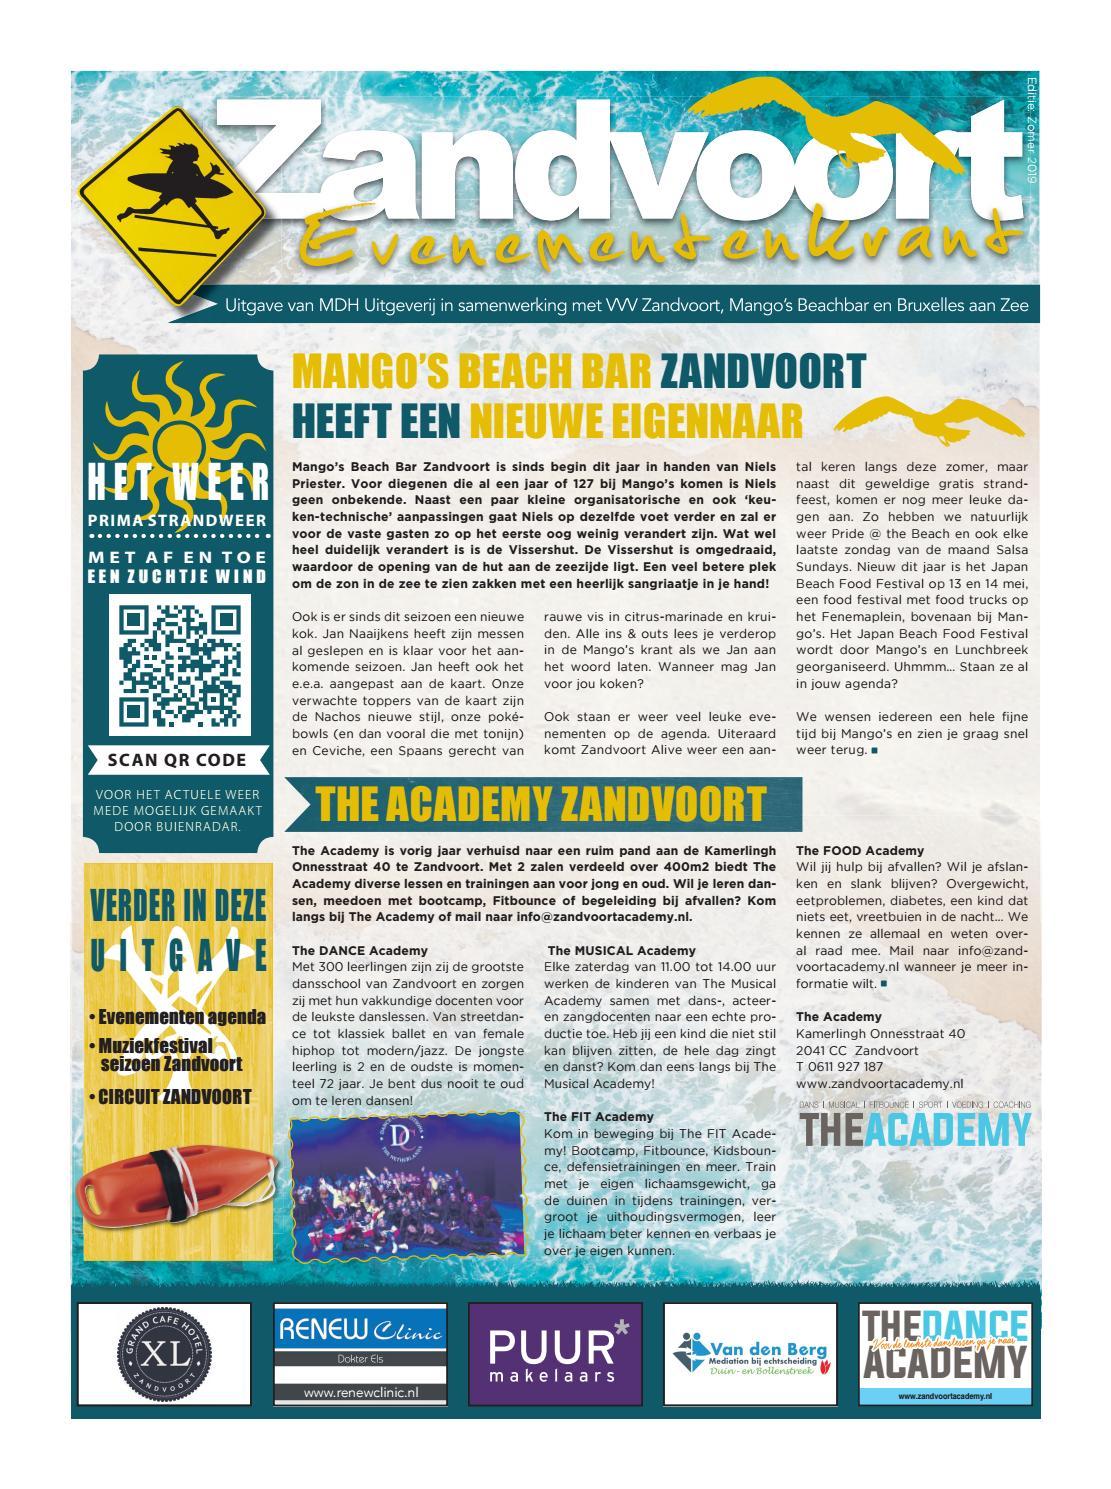 Evenementenkrant Zandvoort By Mdh Uitgeverij Issuu